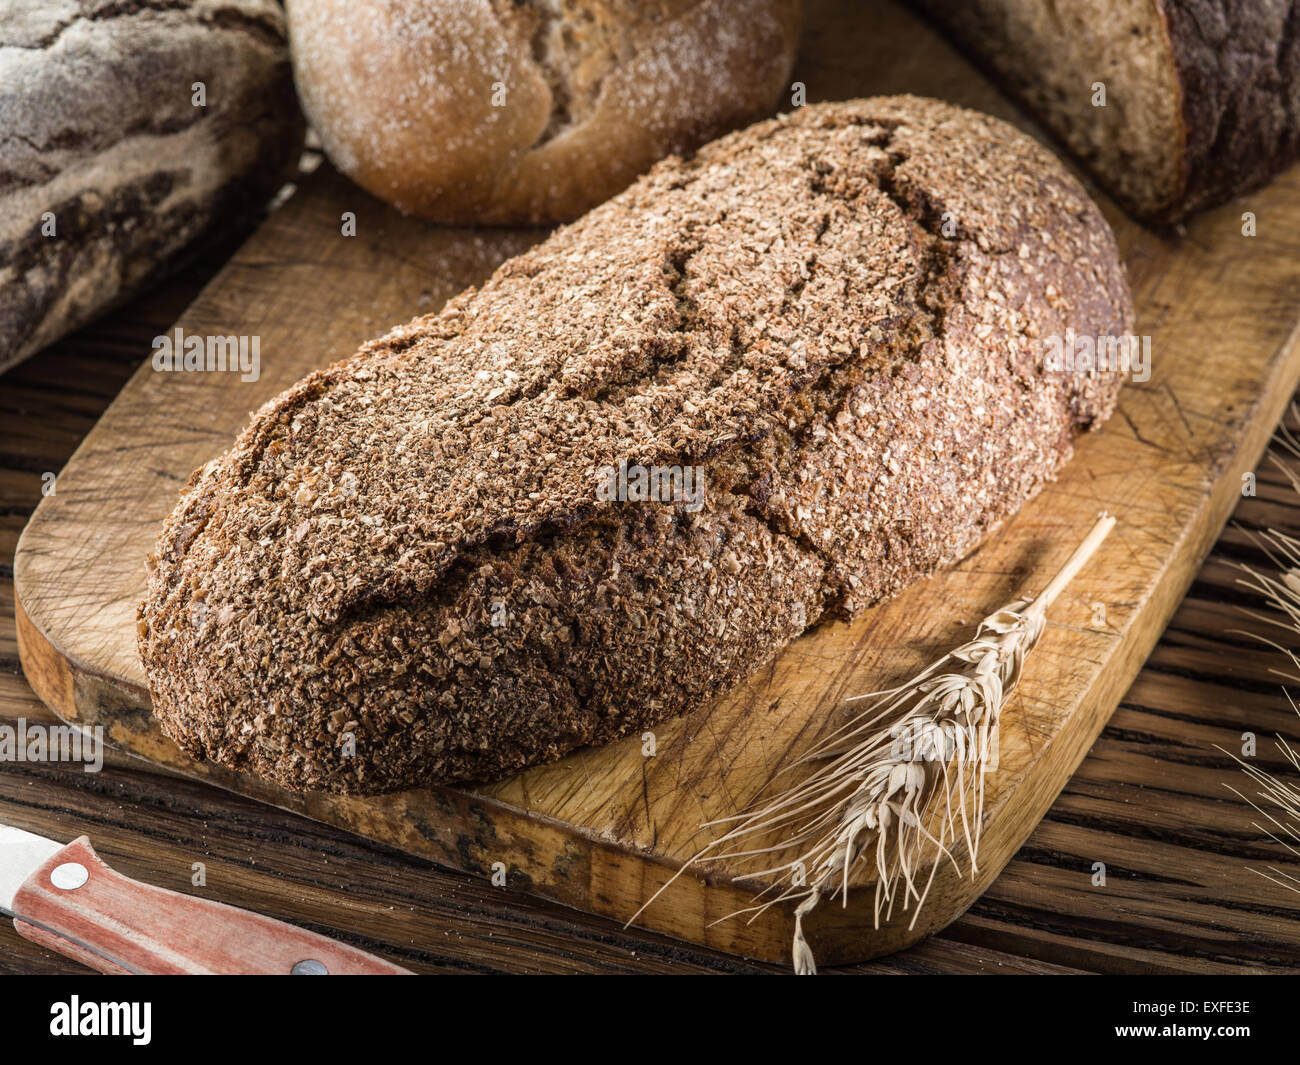 Pan de centeno pan sobre la plancha de madera. Imagen De Stock